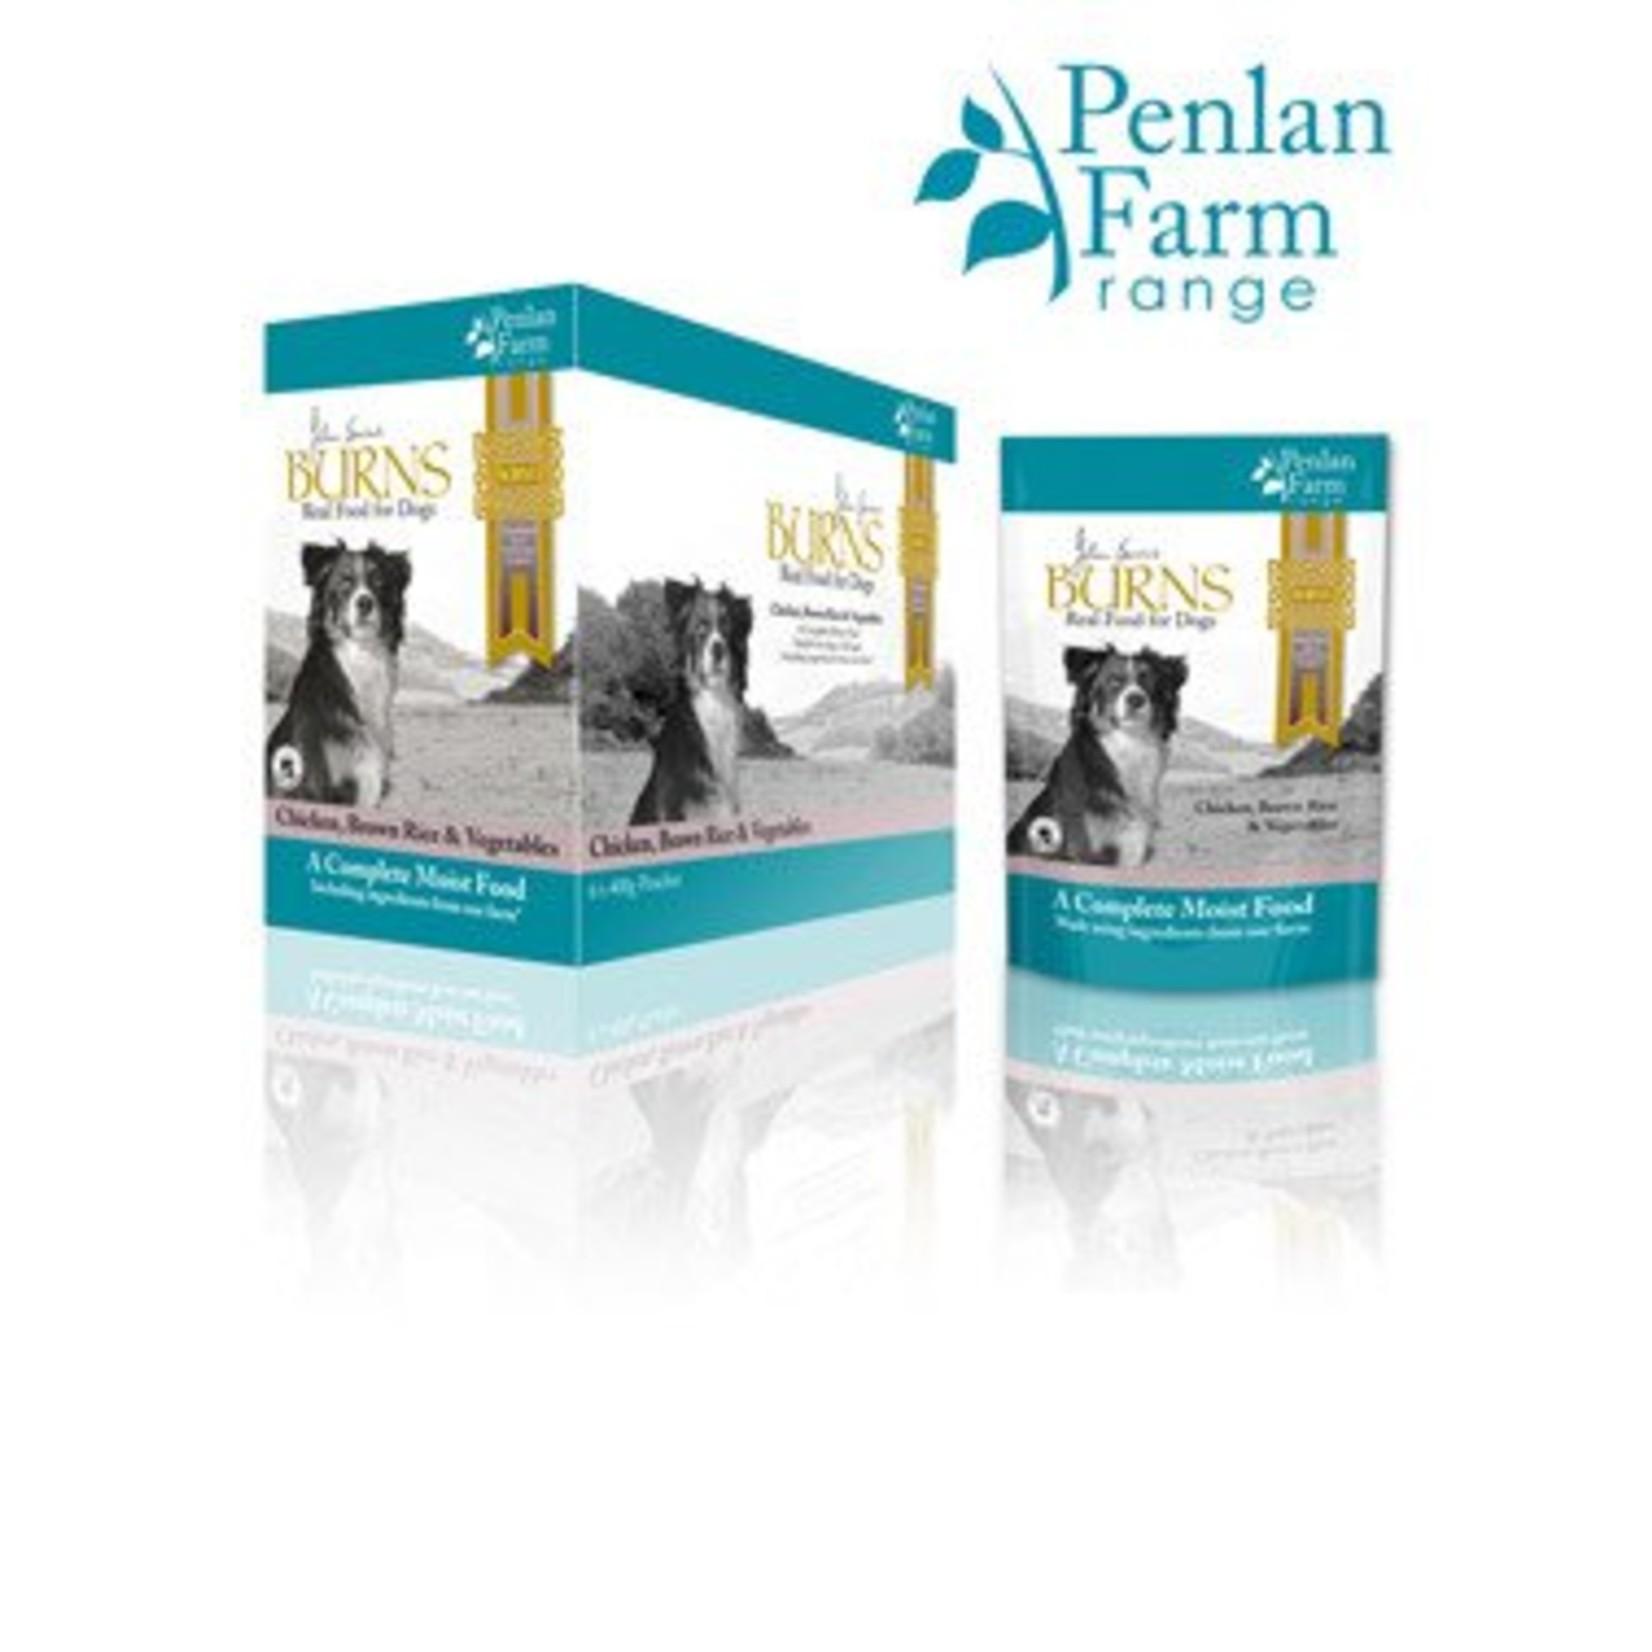 Burns Penlan Farm Dog Wet Food Pouch Complete Chicken Brown Rice & Veg 400g, Box of 6